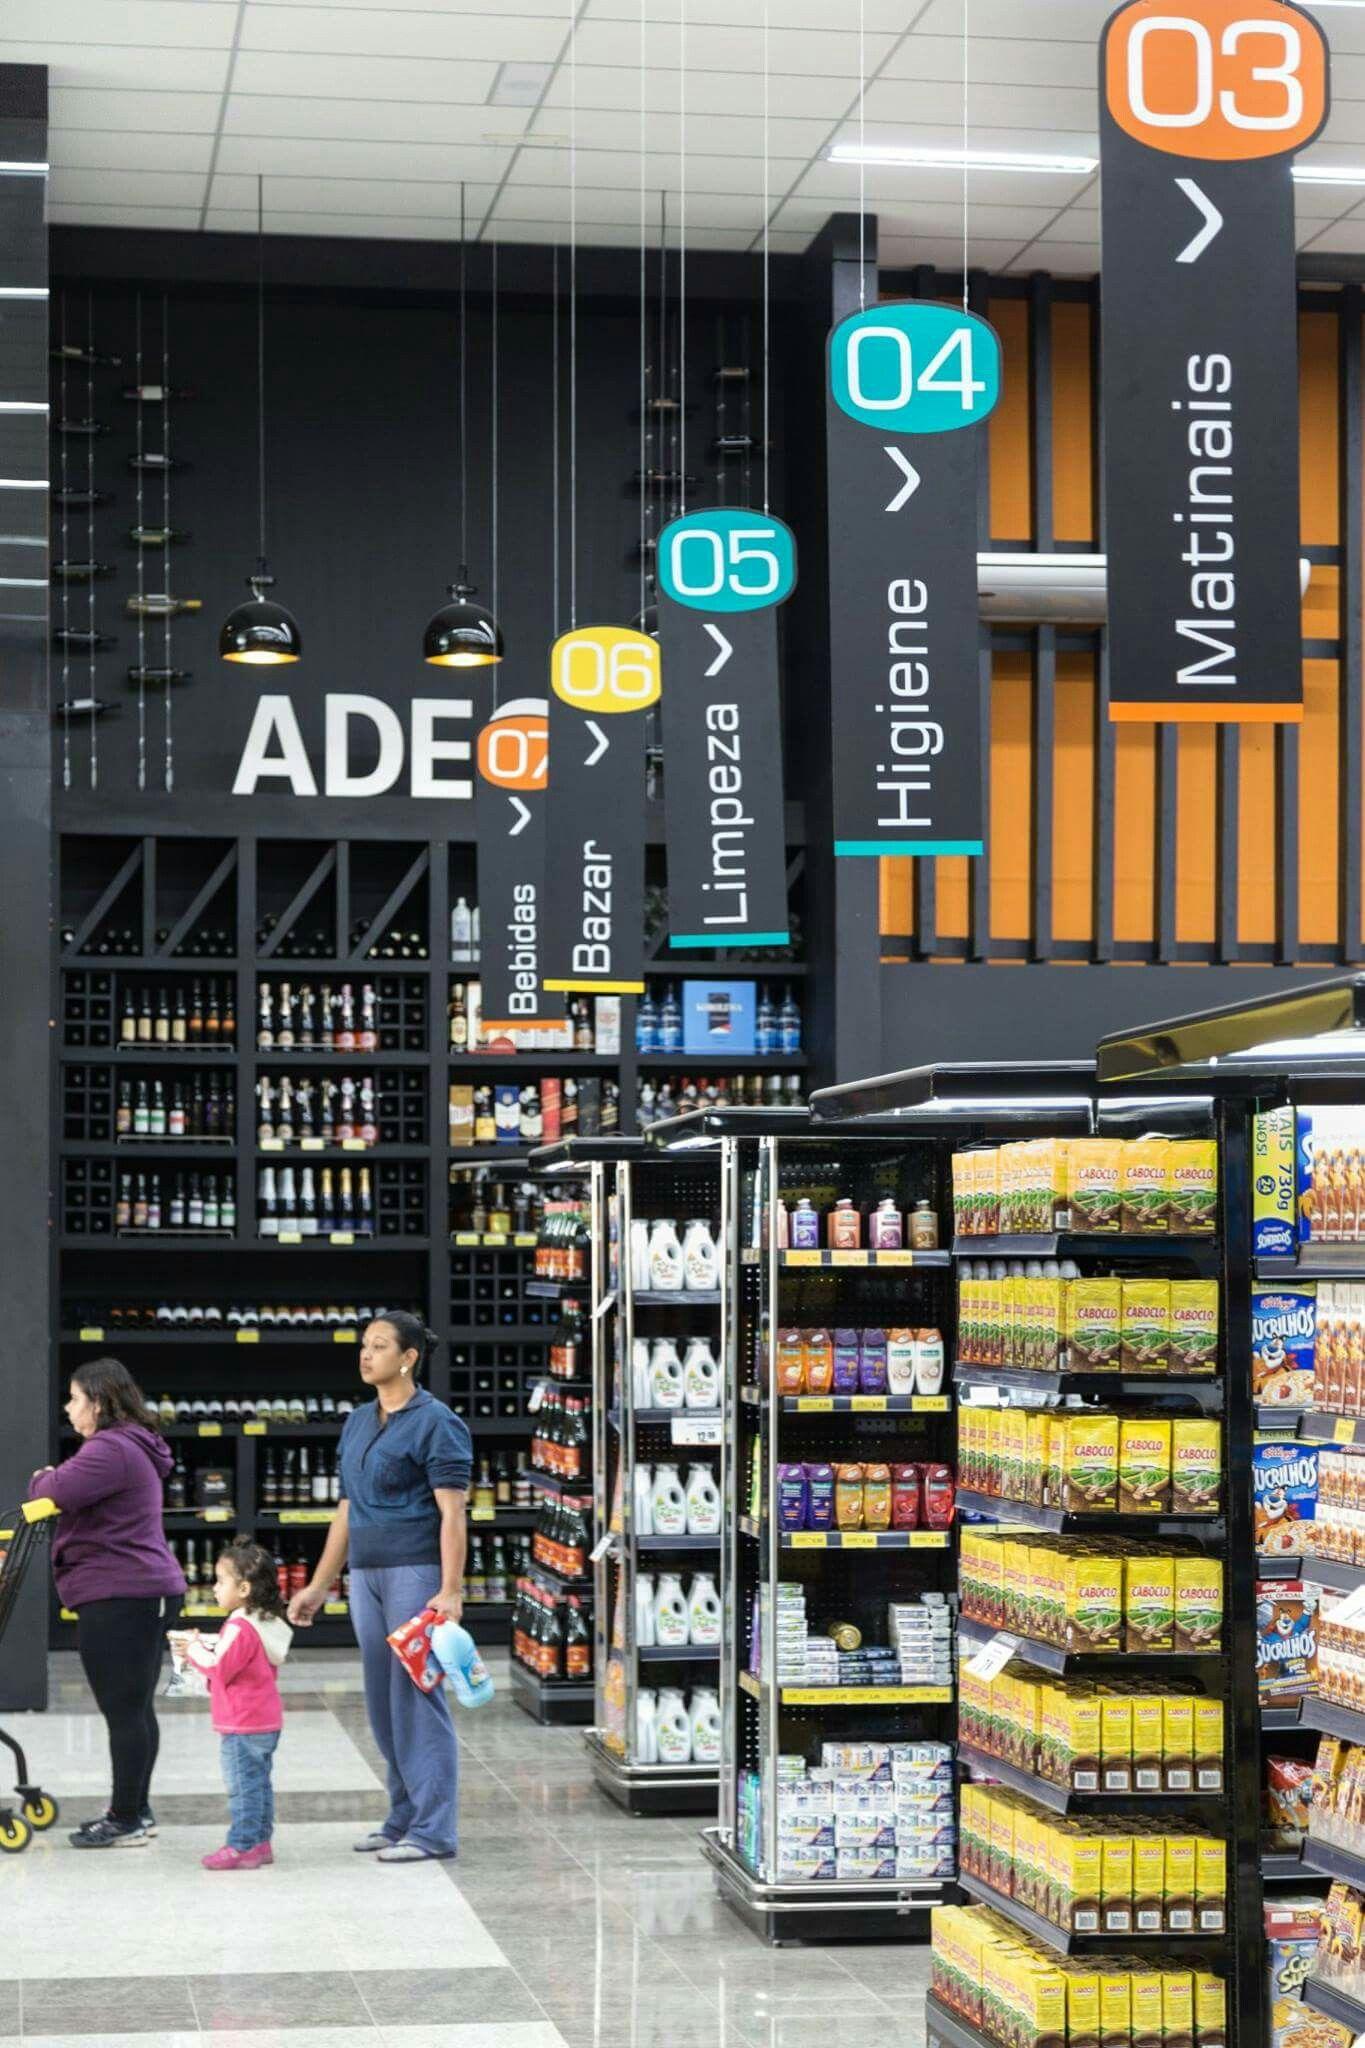 supermercado konig デザイン アイデア pinterest